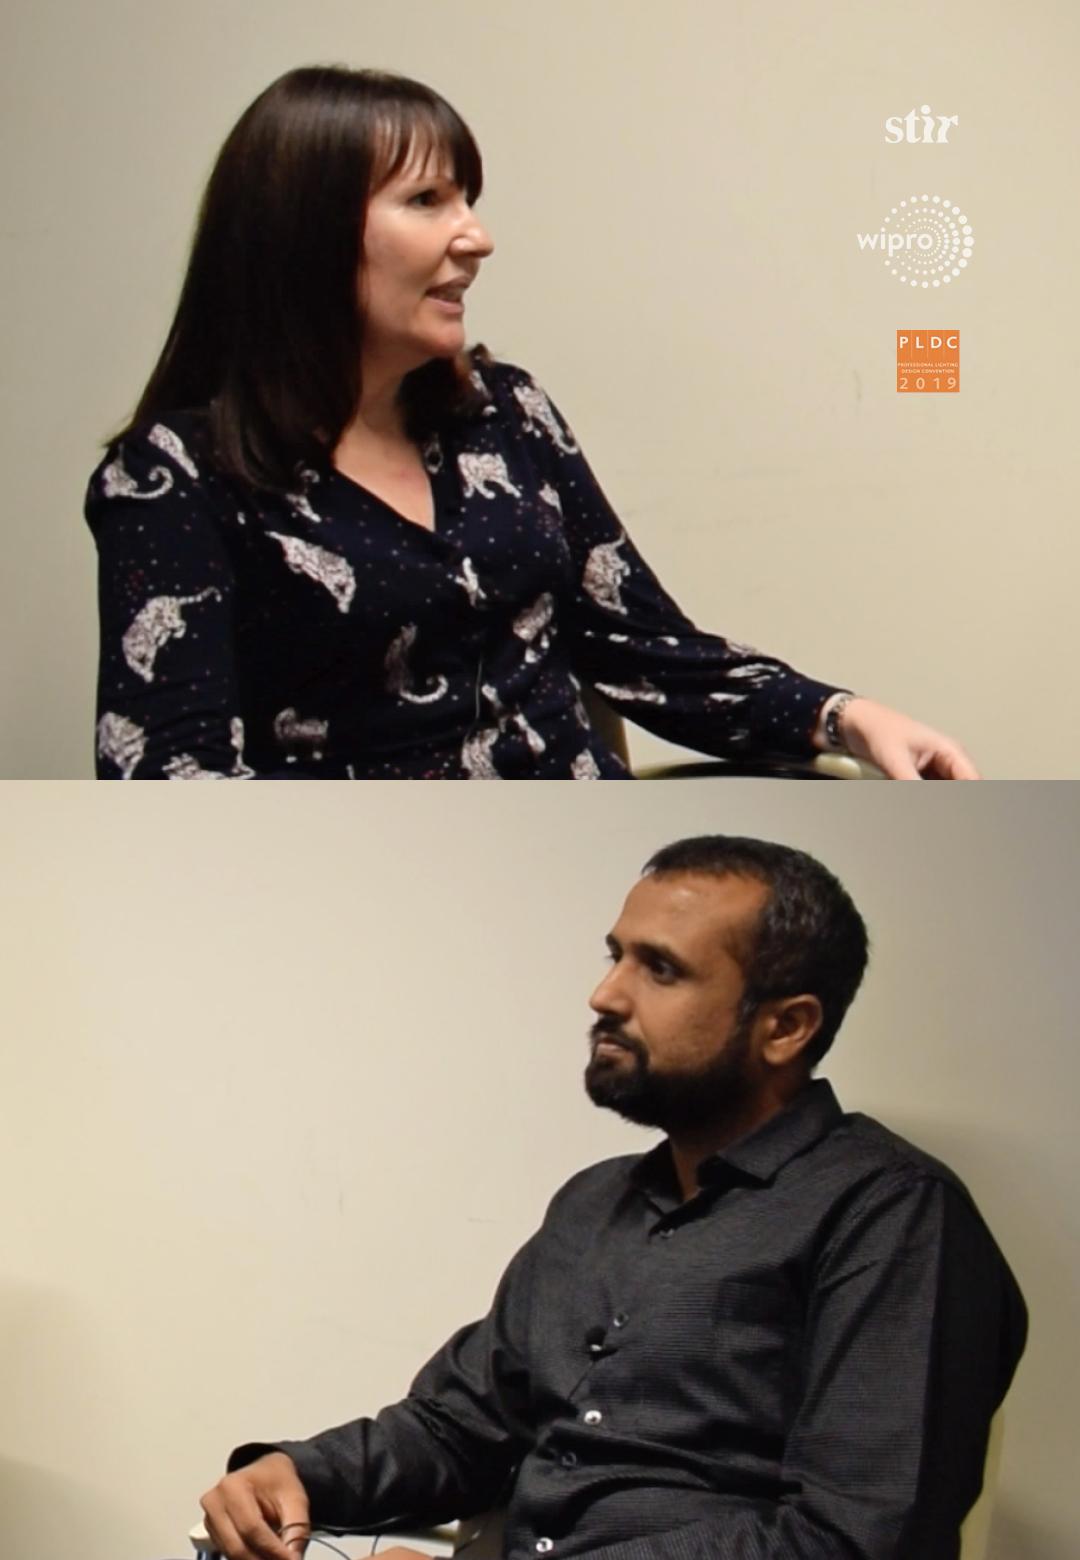 Linus Lopez (centre) in conversation with lighting designers Lorraine Calcott (left) and Nirmit Jhaveri (right), for Spread the Light | Lorraine Calcott| Nirmit Jhaveri | PLDC 2019 | Spread the Light| STIRworld